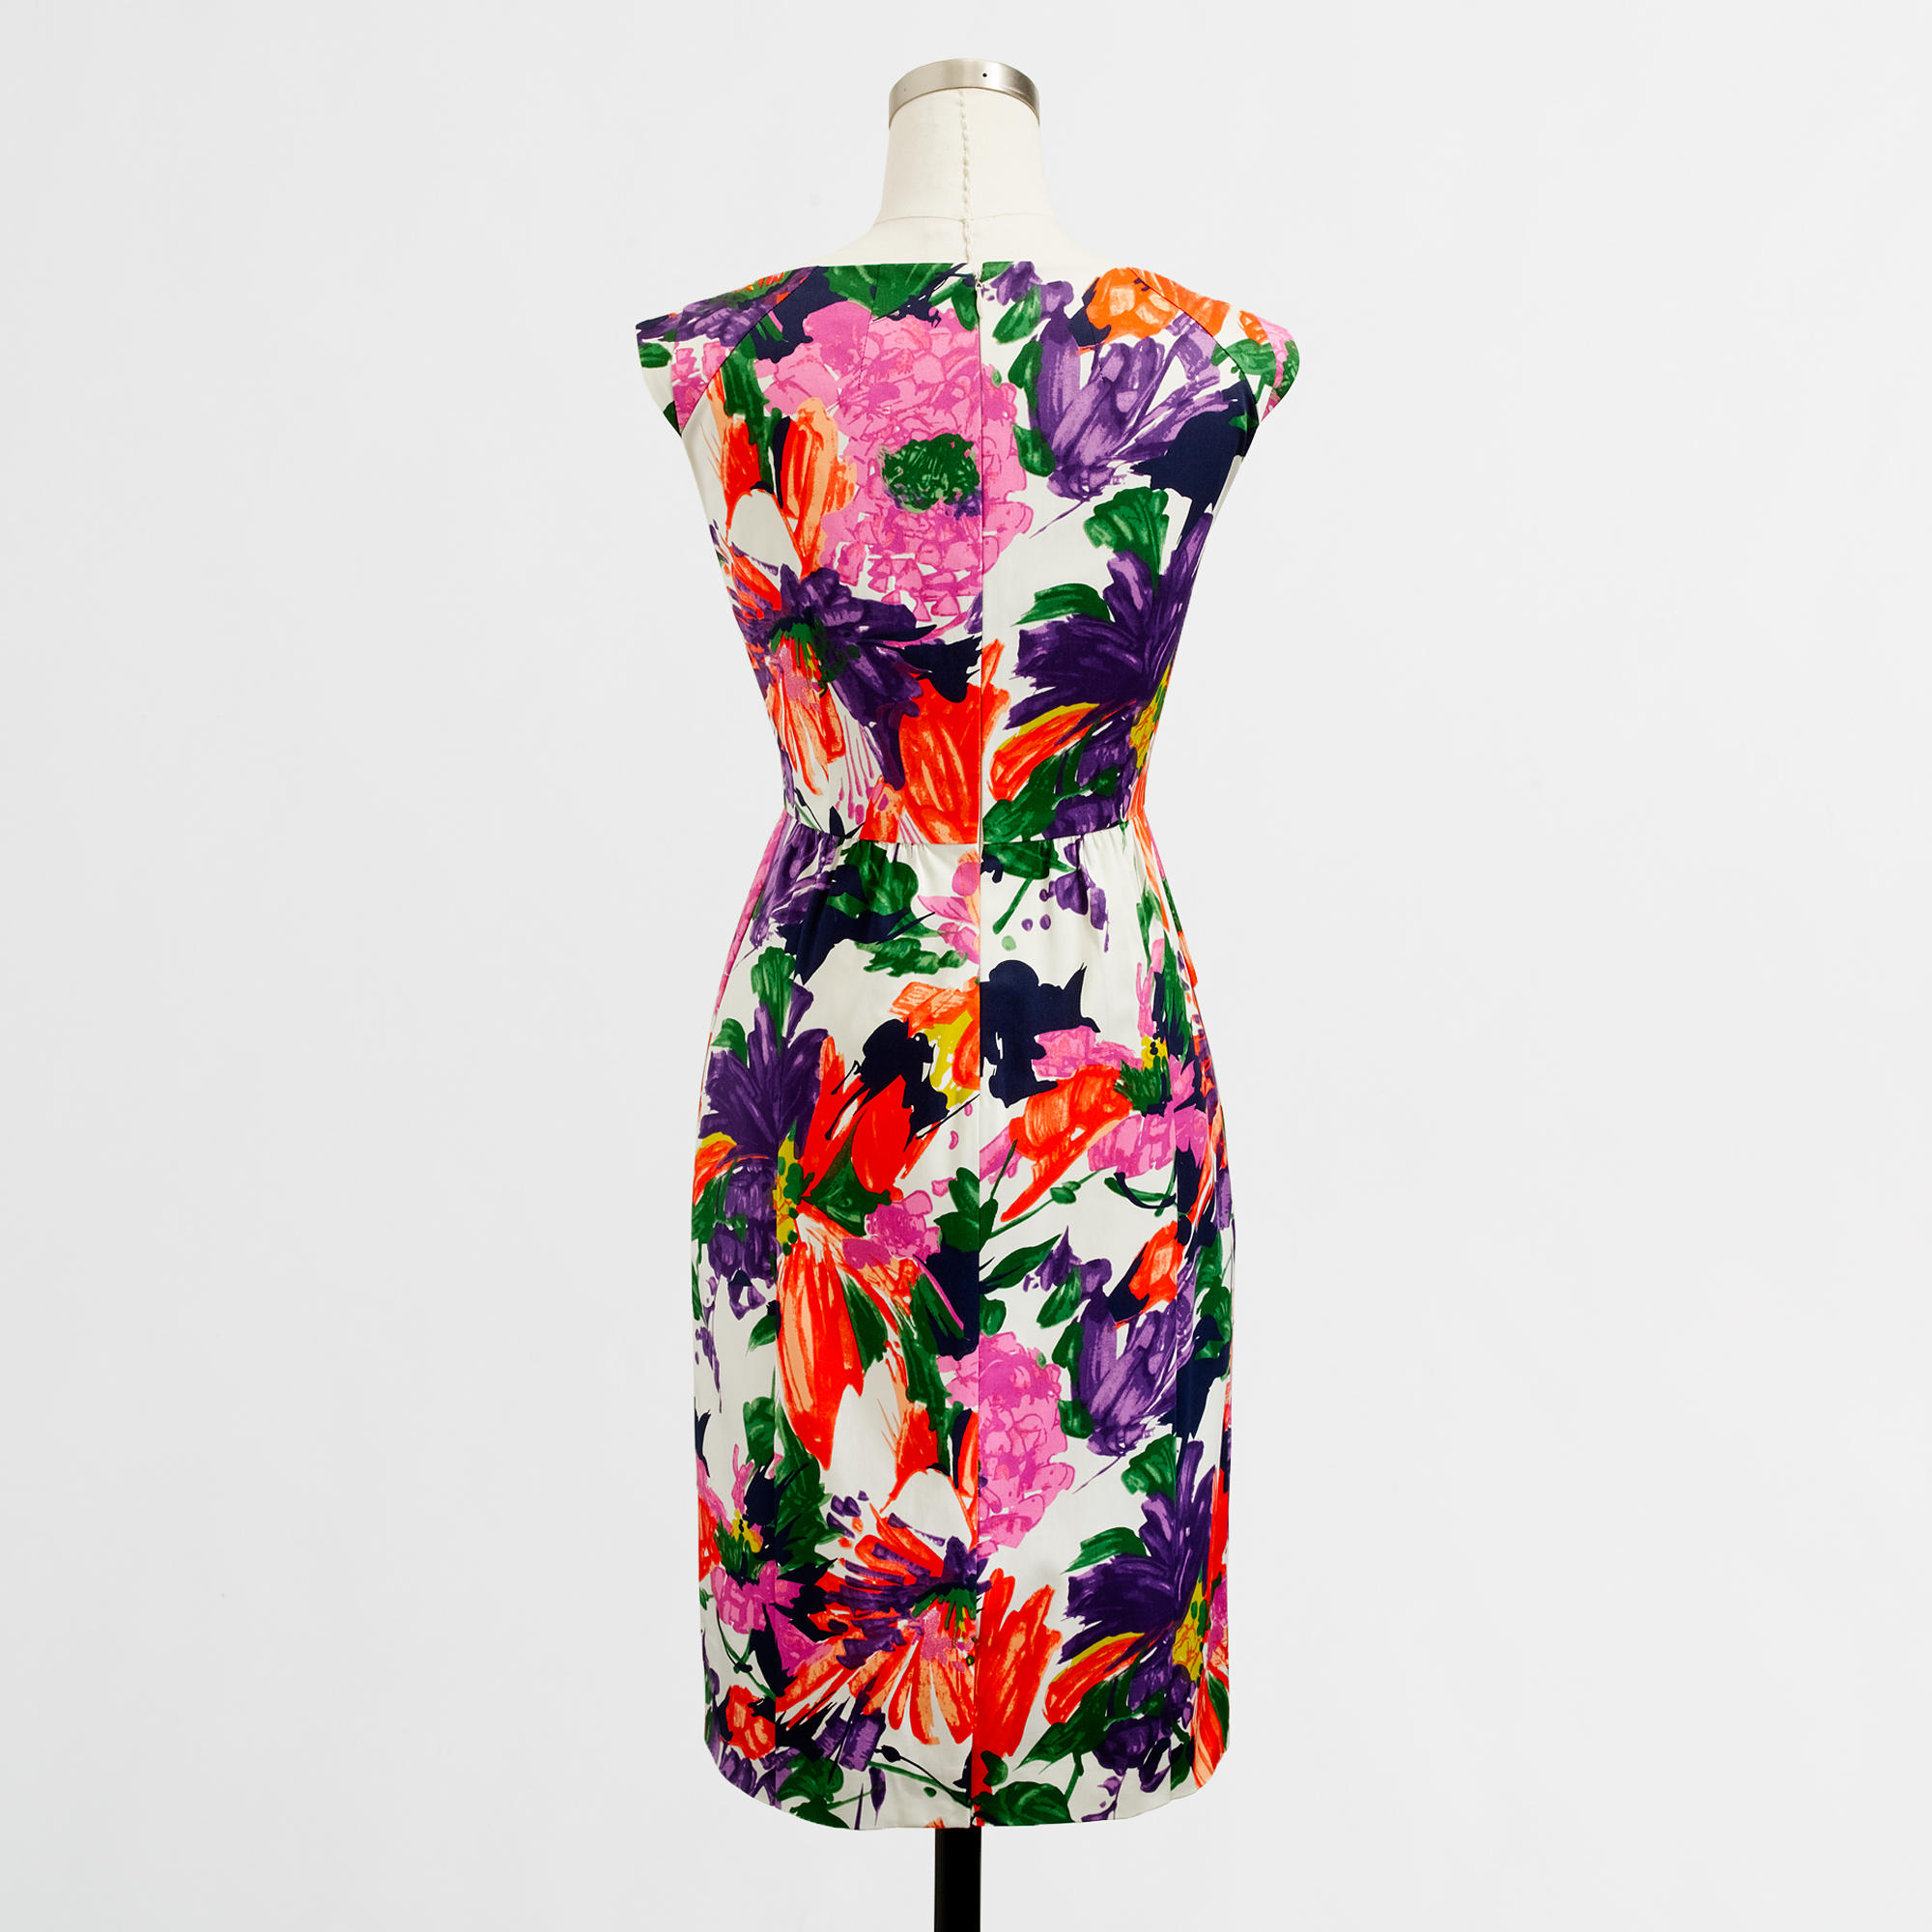 Factory Printed Cora Dress